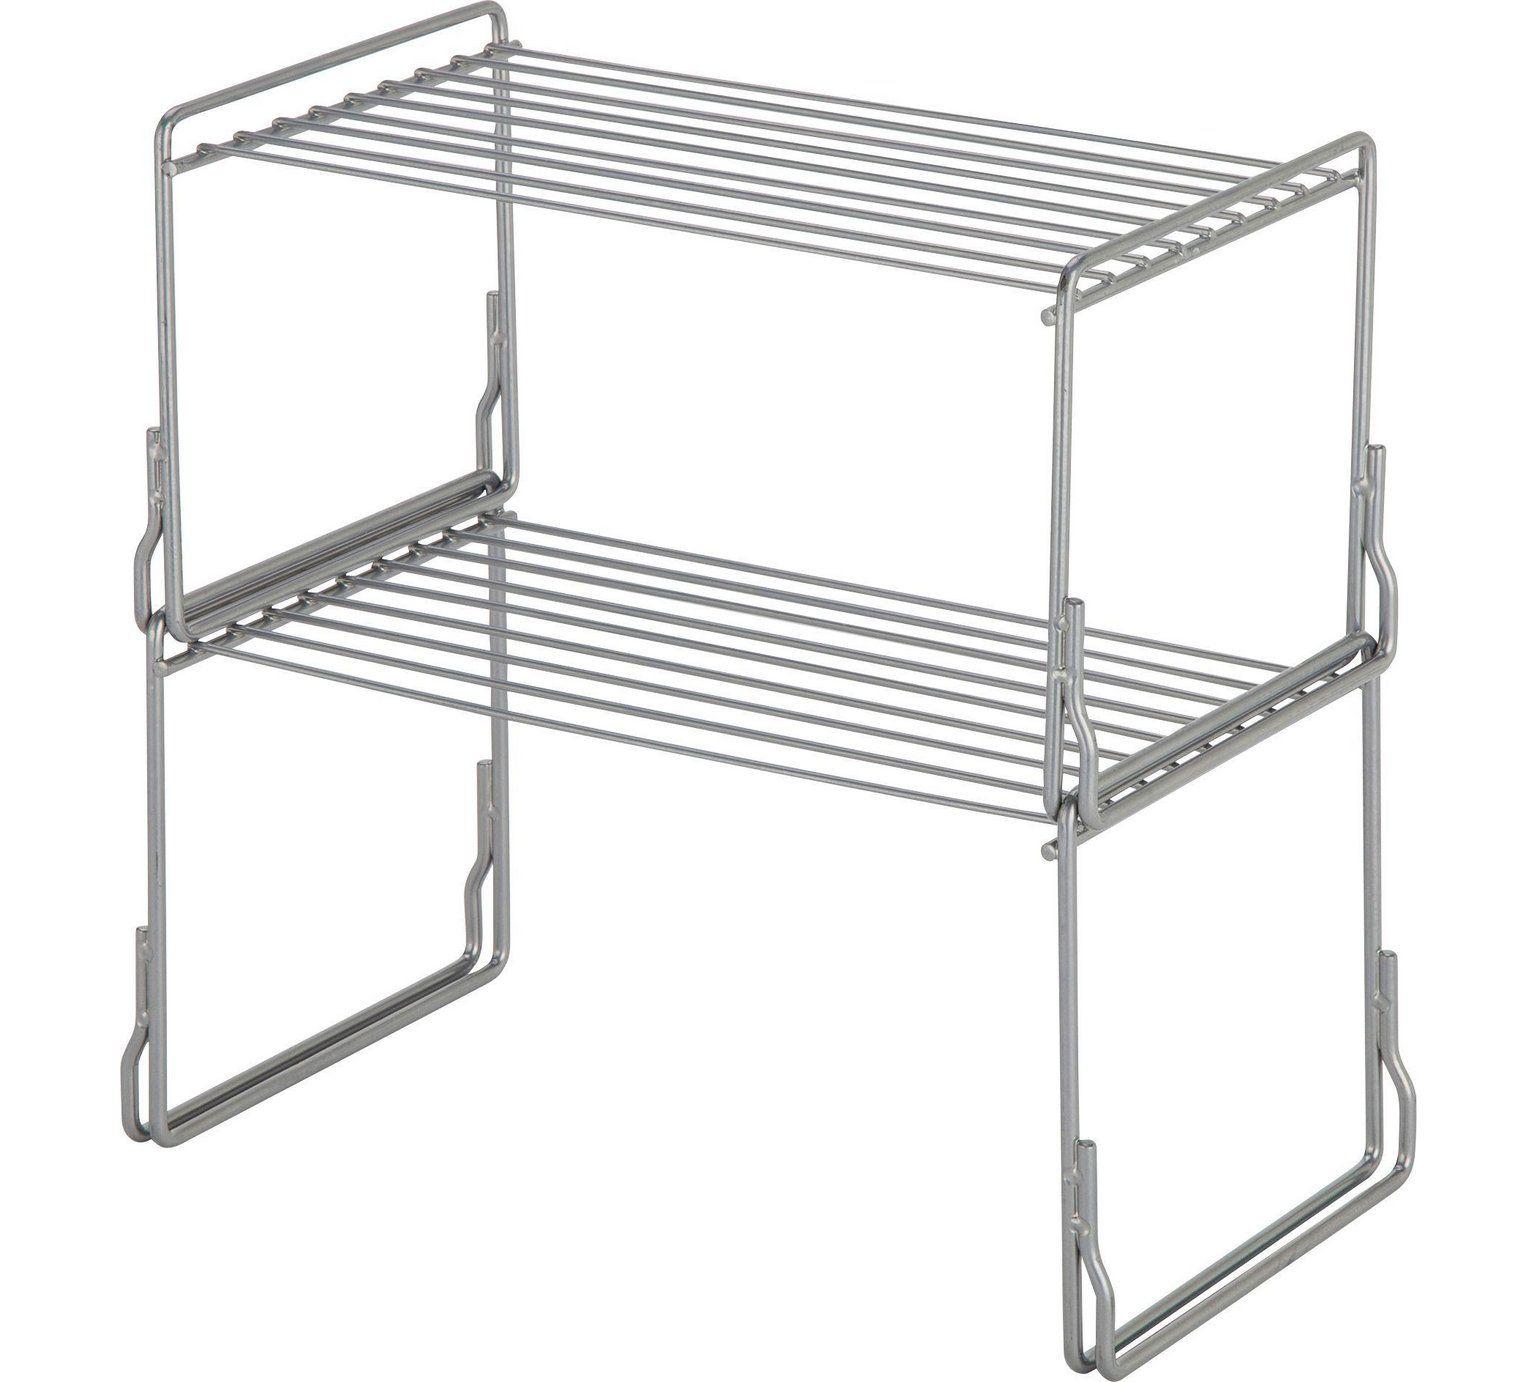 buy home steel cupboard storage solution at argos.co.uk, visit argos